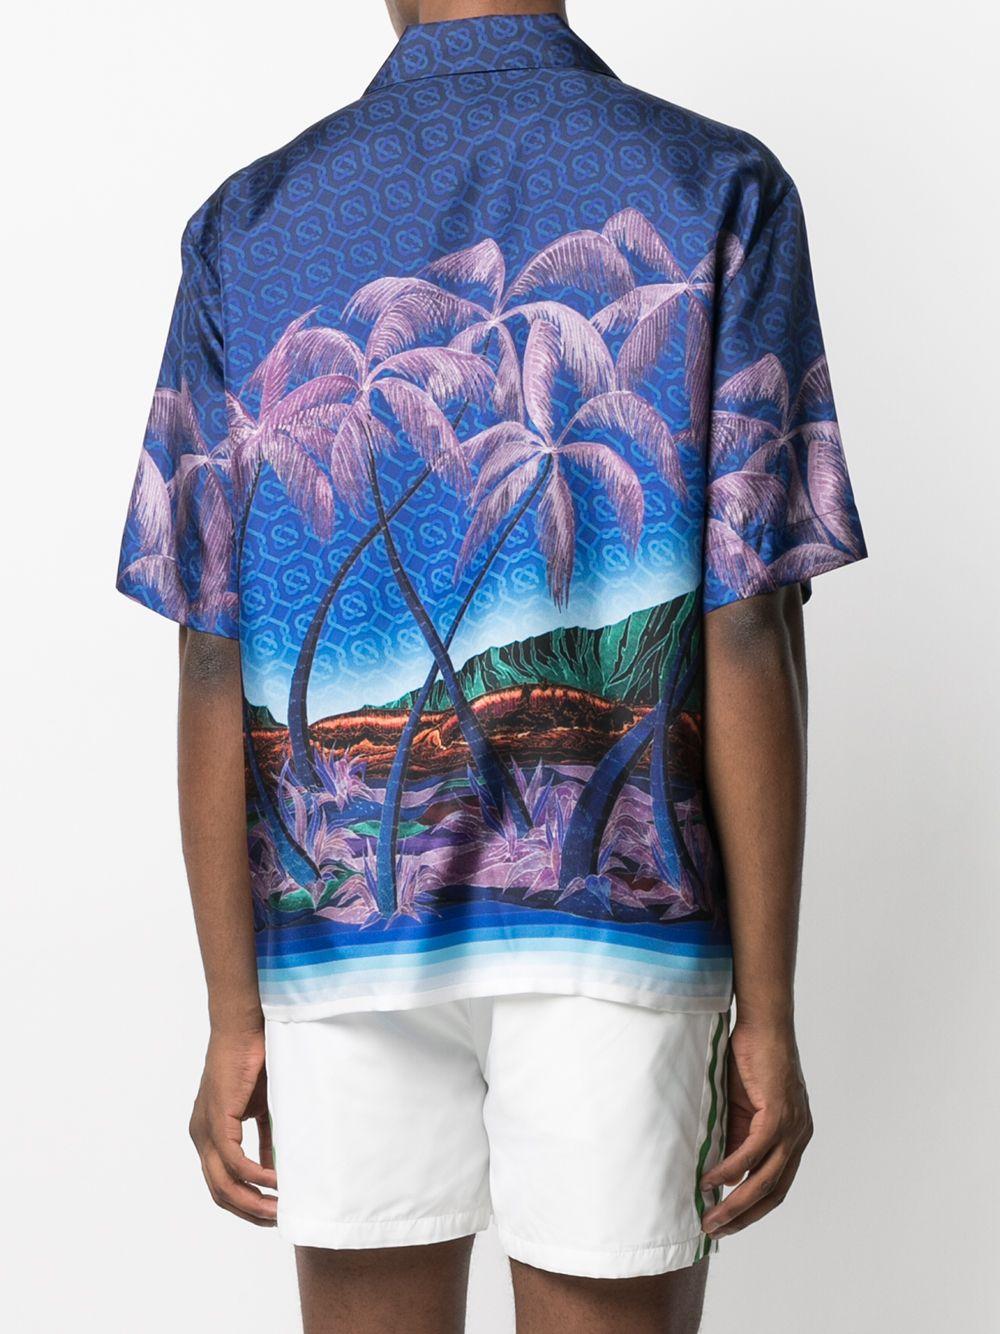 Casablanca camicia con stampa di palme uomo CASABLANCA   Camicie   MS21-SH-003NUIT